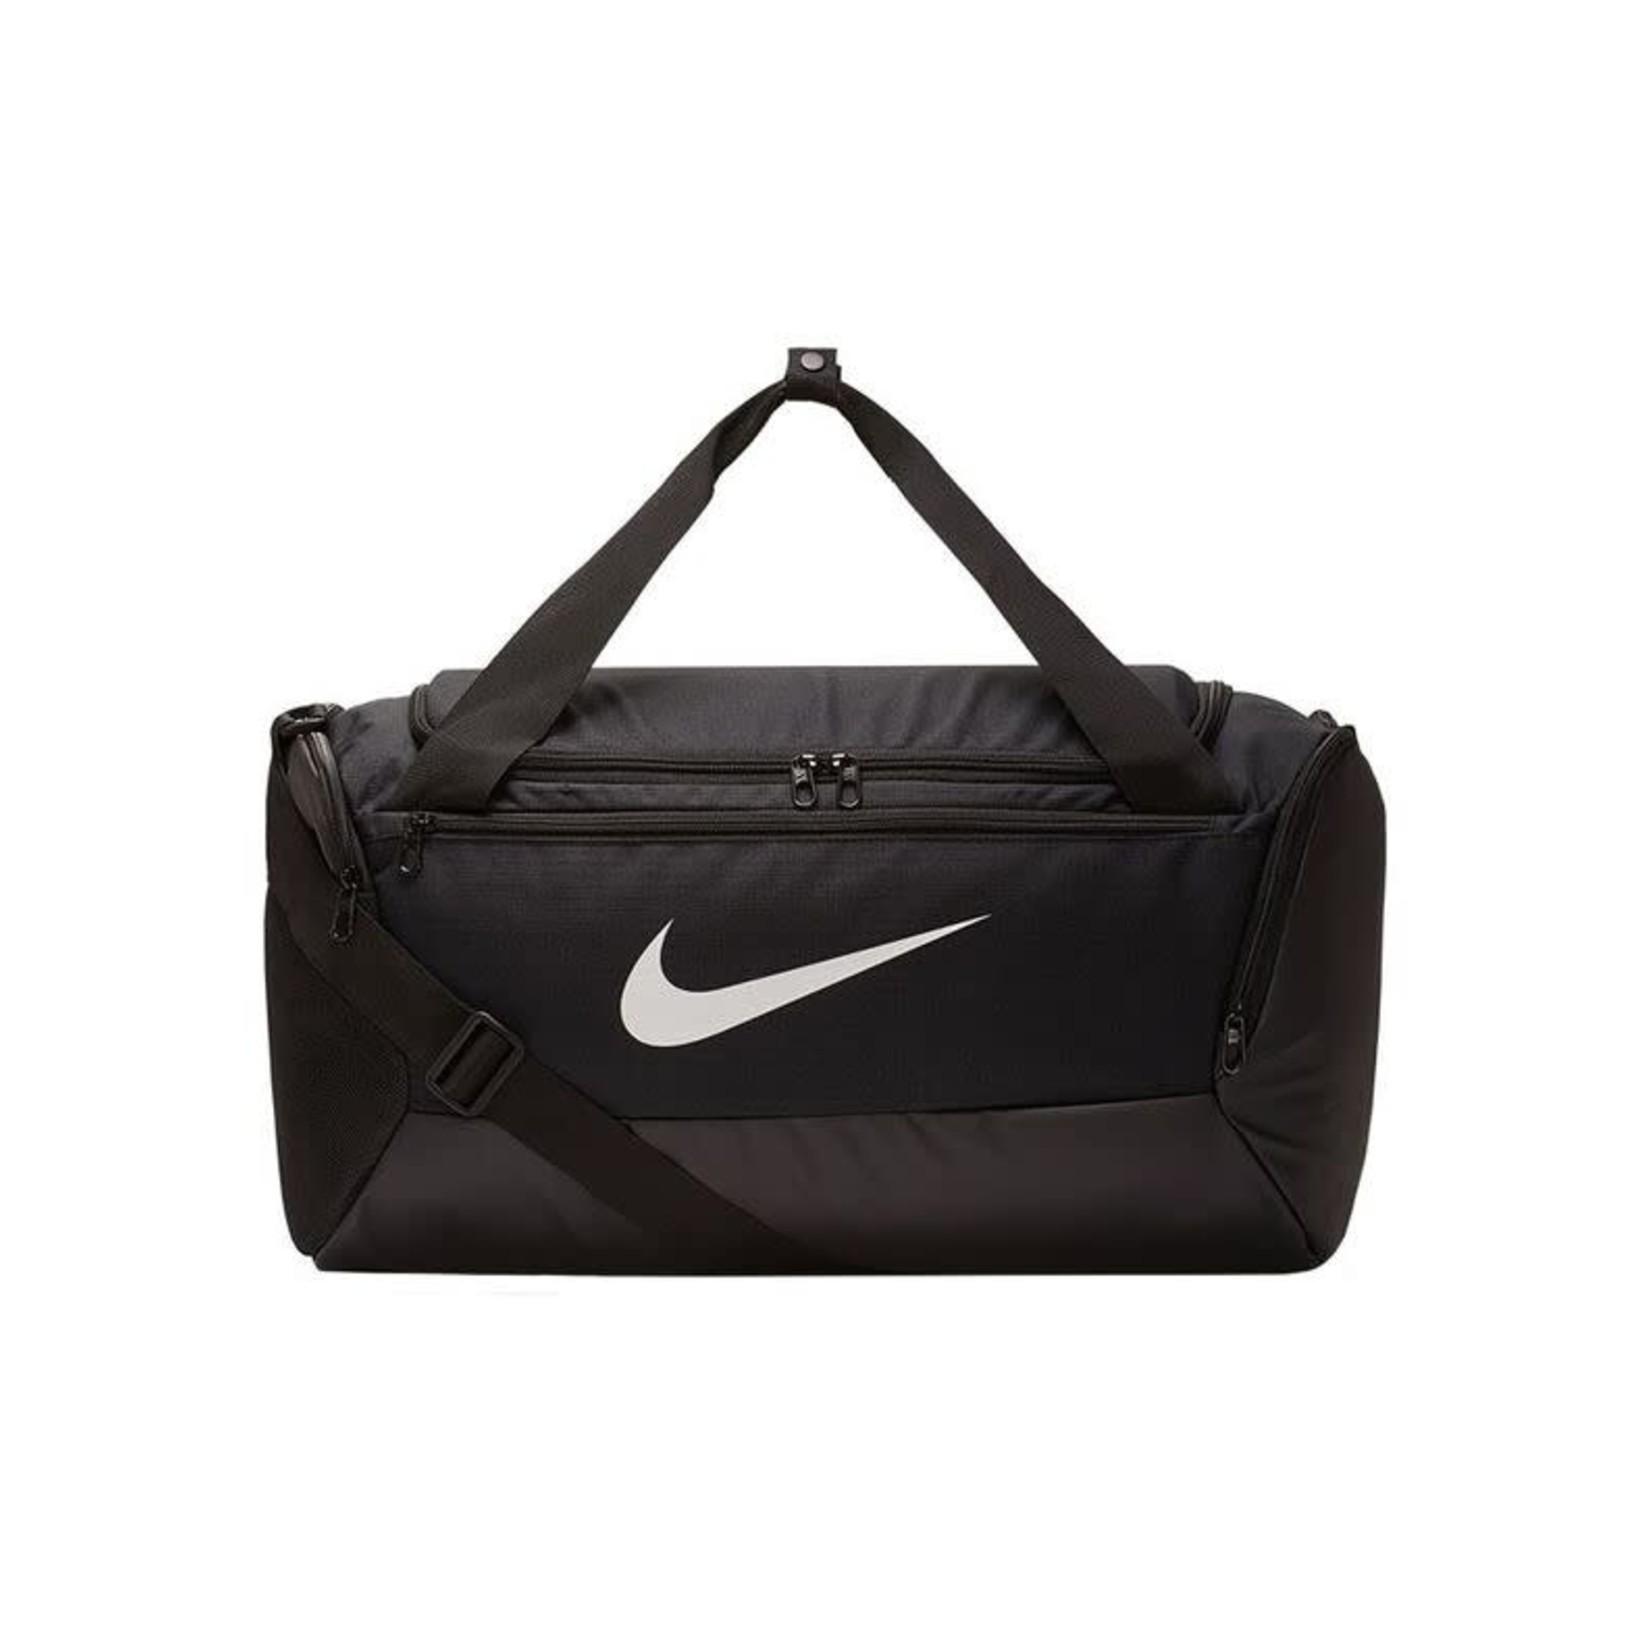 Nike Nike Duffel Bag, Brasilia 9.0, SM